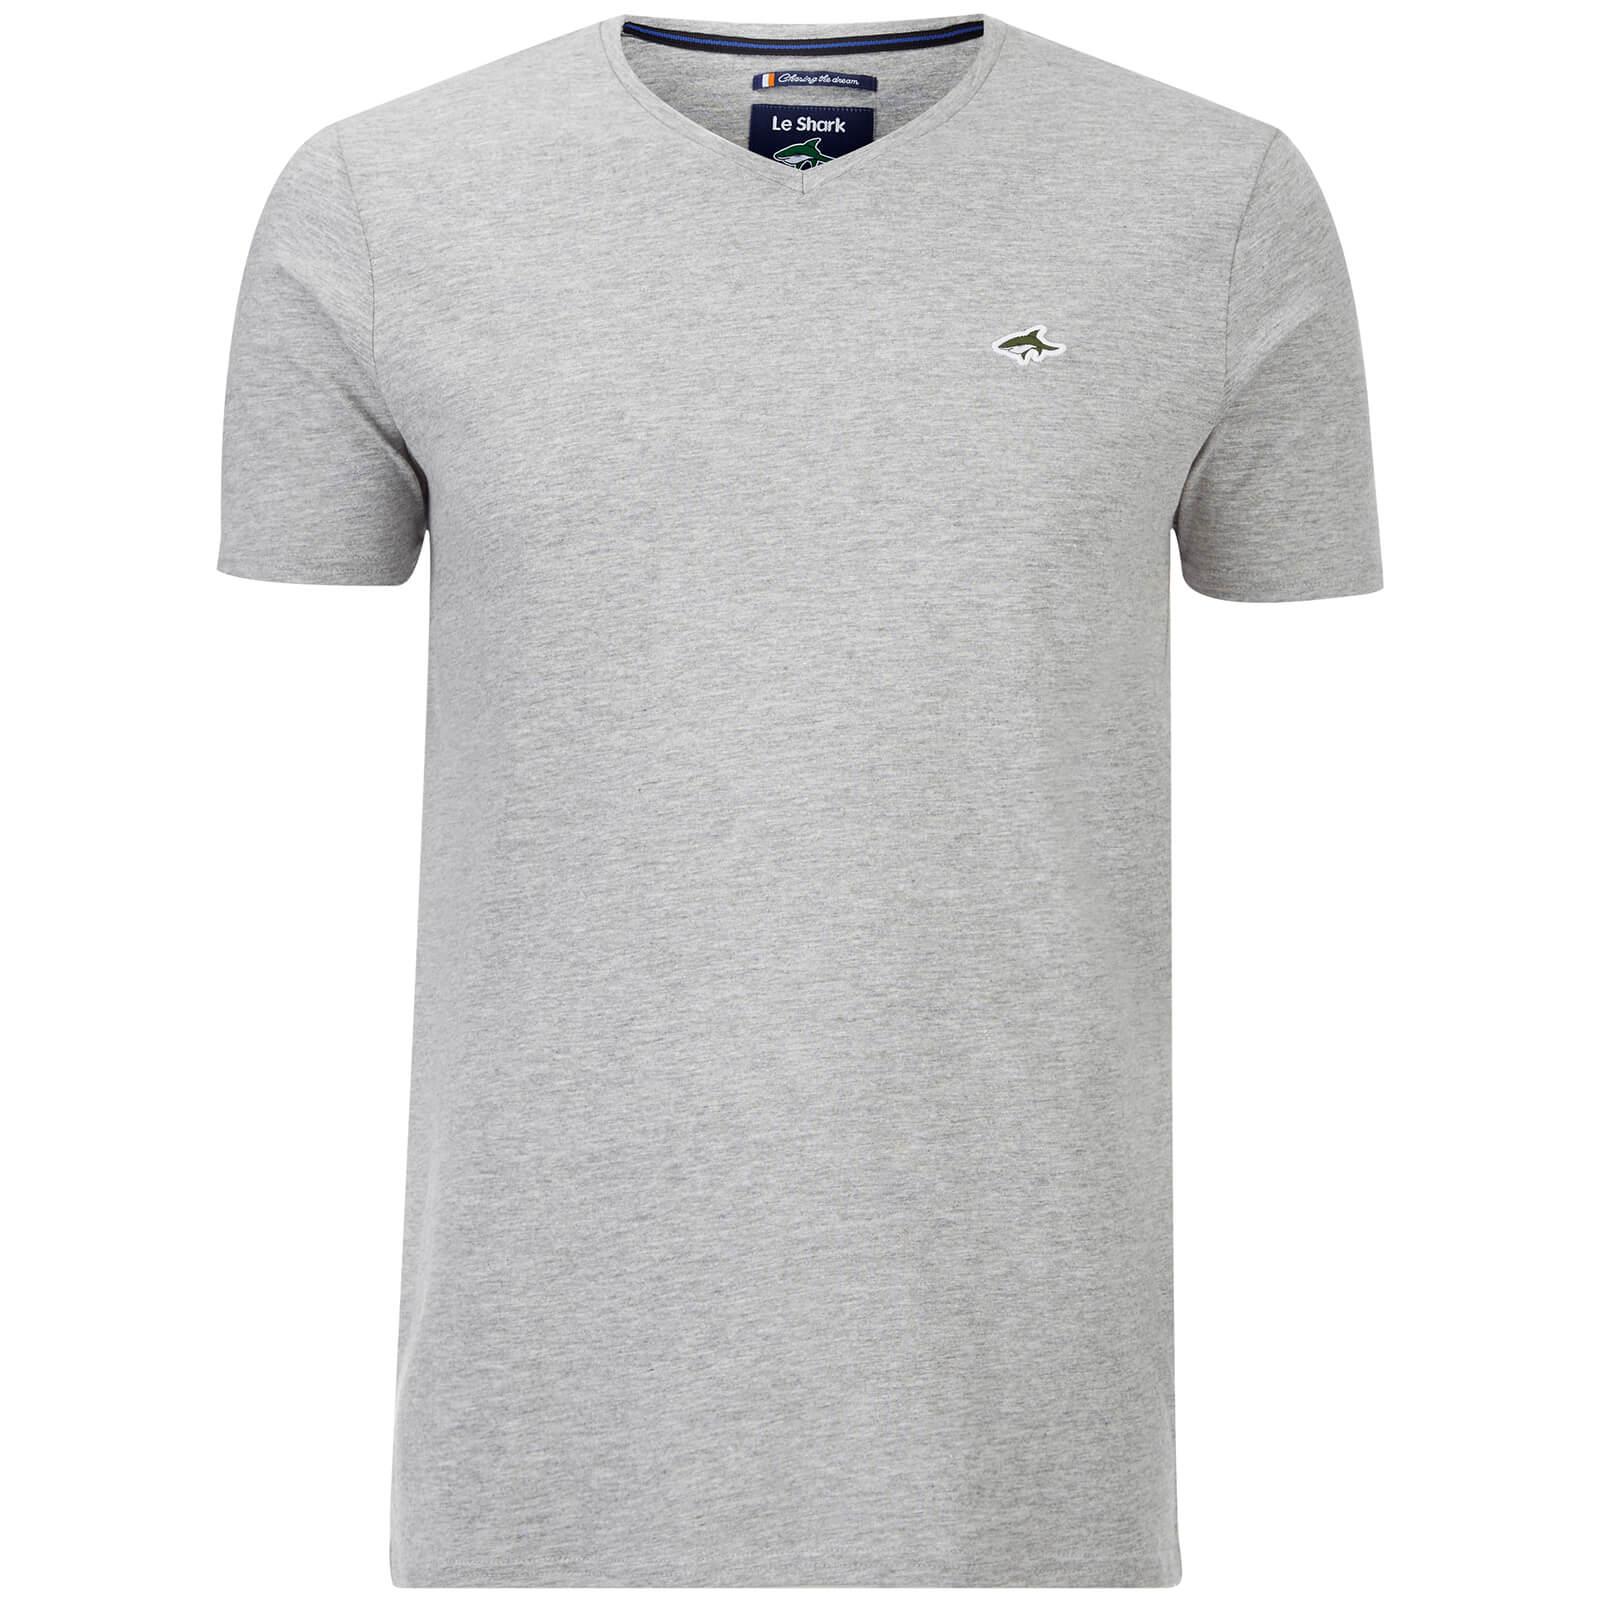 8fa83f6f75a6 Le Shark Men s Glasshouse V Neck T-Shirt - Light Grey Marl Clothing ...